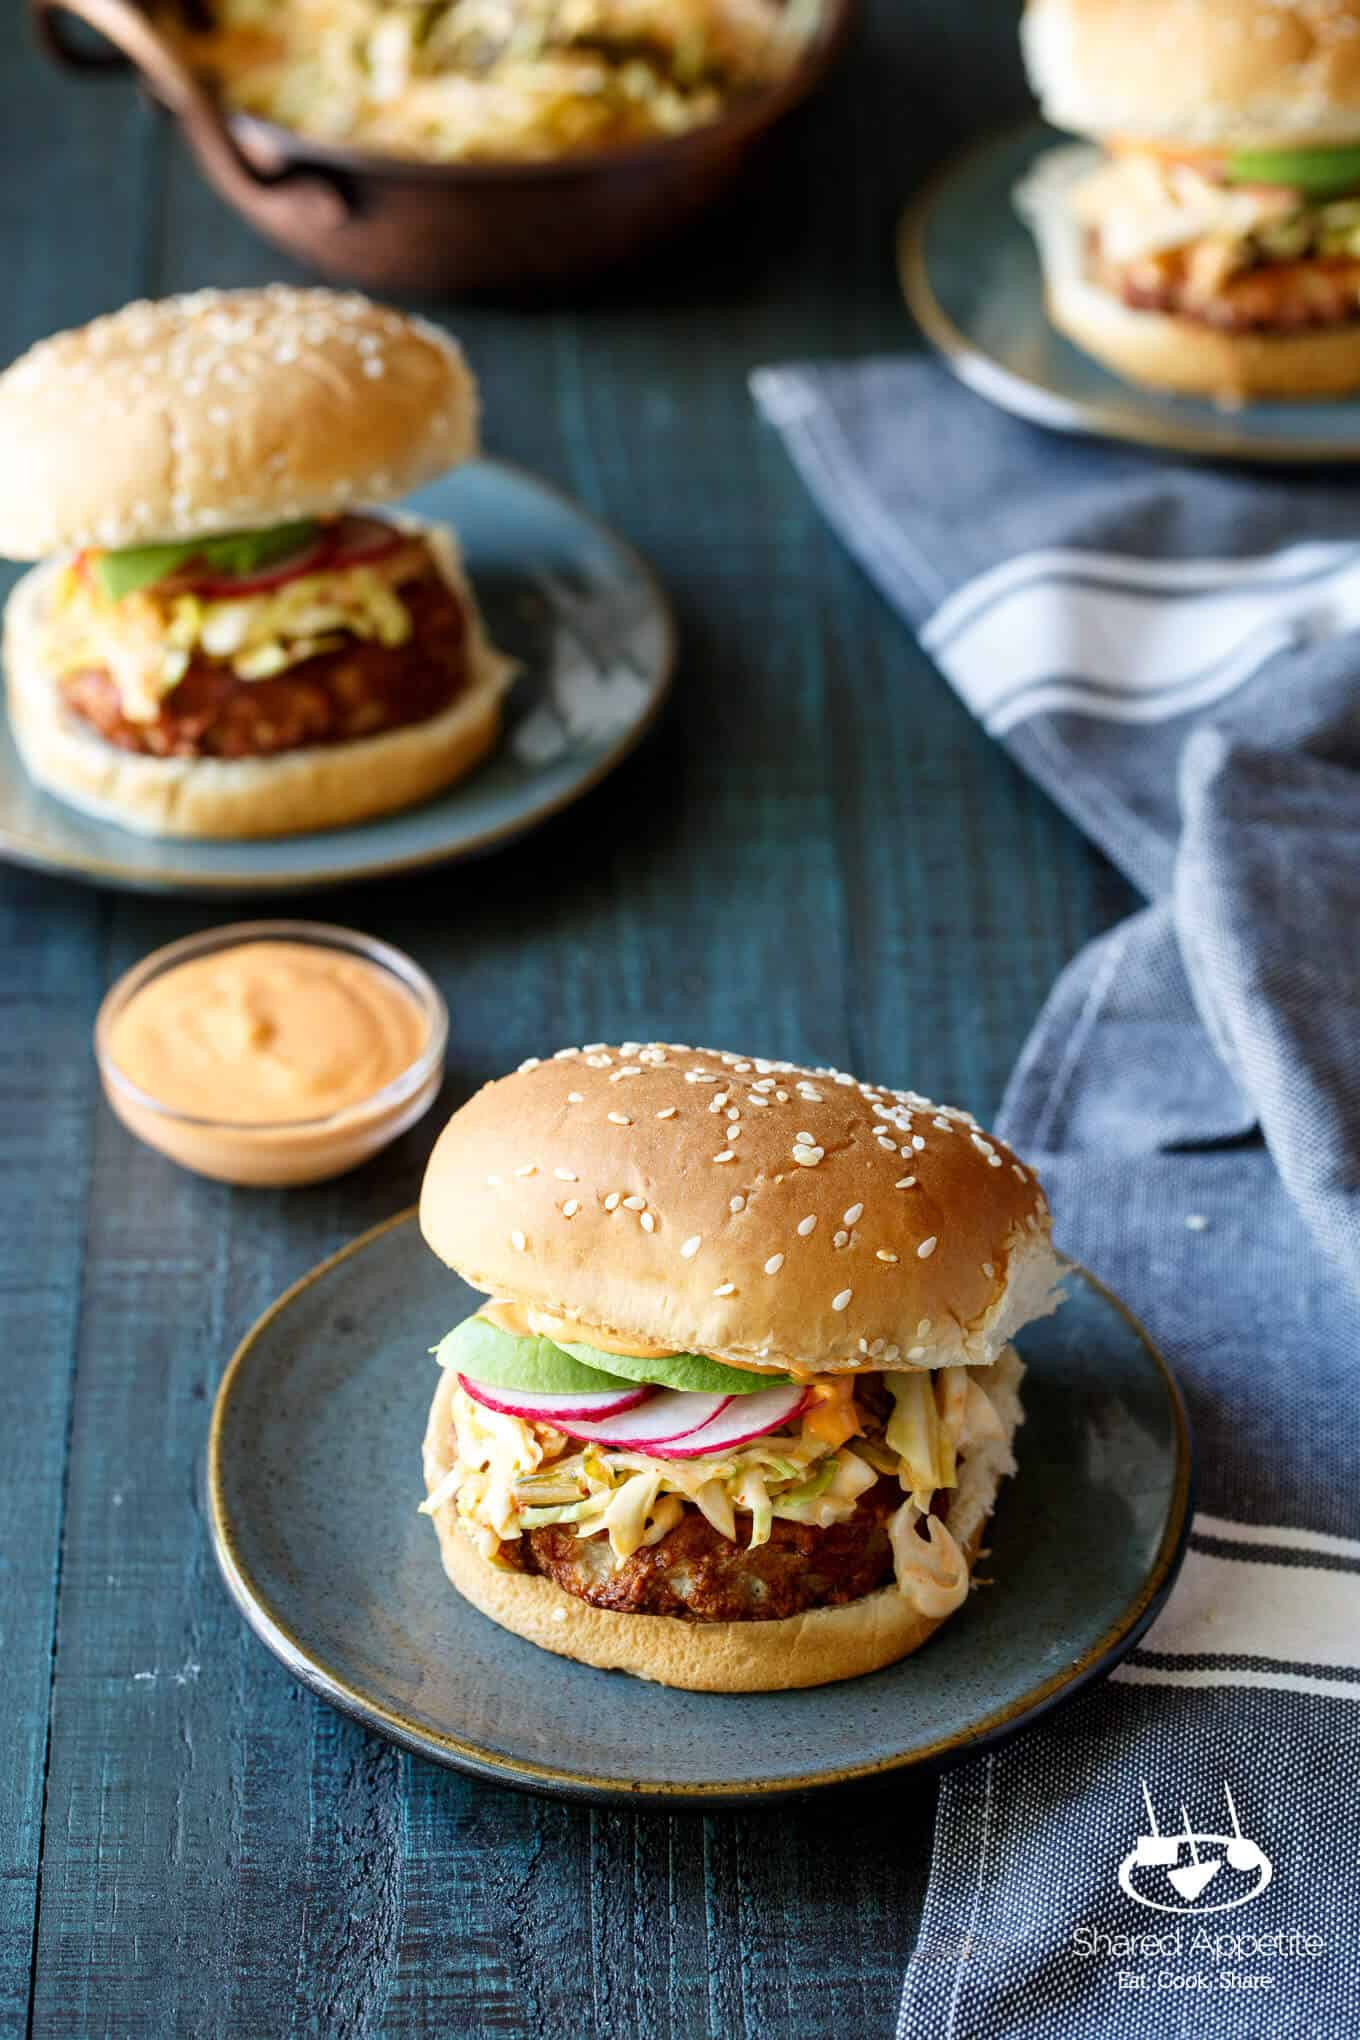 Korean Turkey Burgers with Kimchi Slaw, Avocado, and Gochujang Aioli | sharedappetite.com